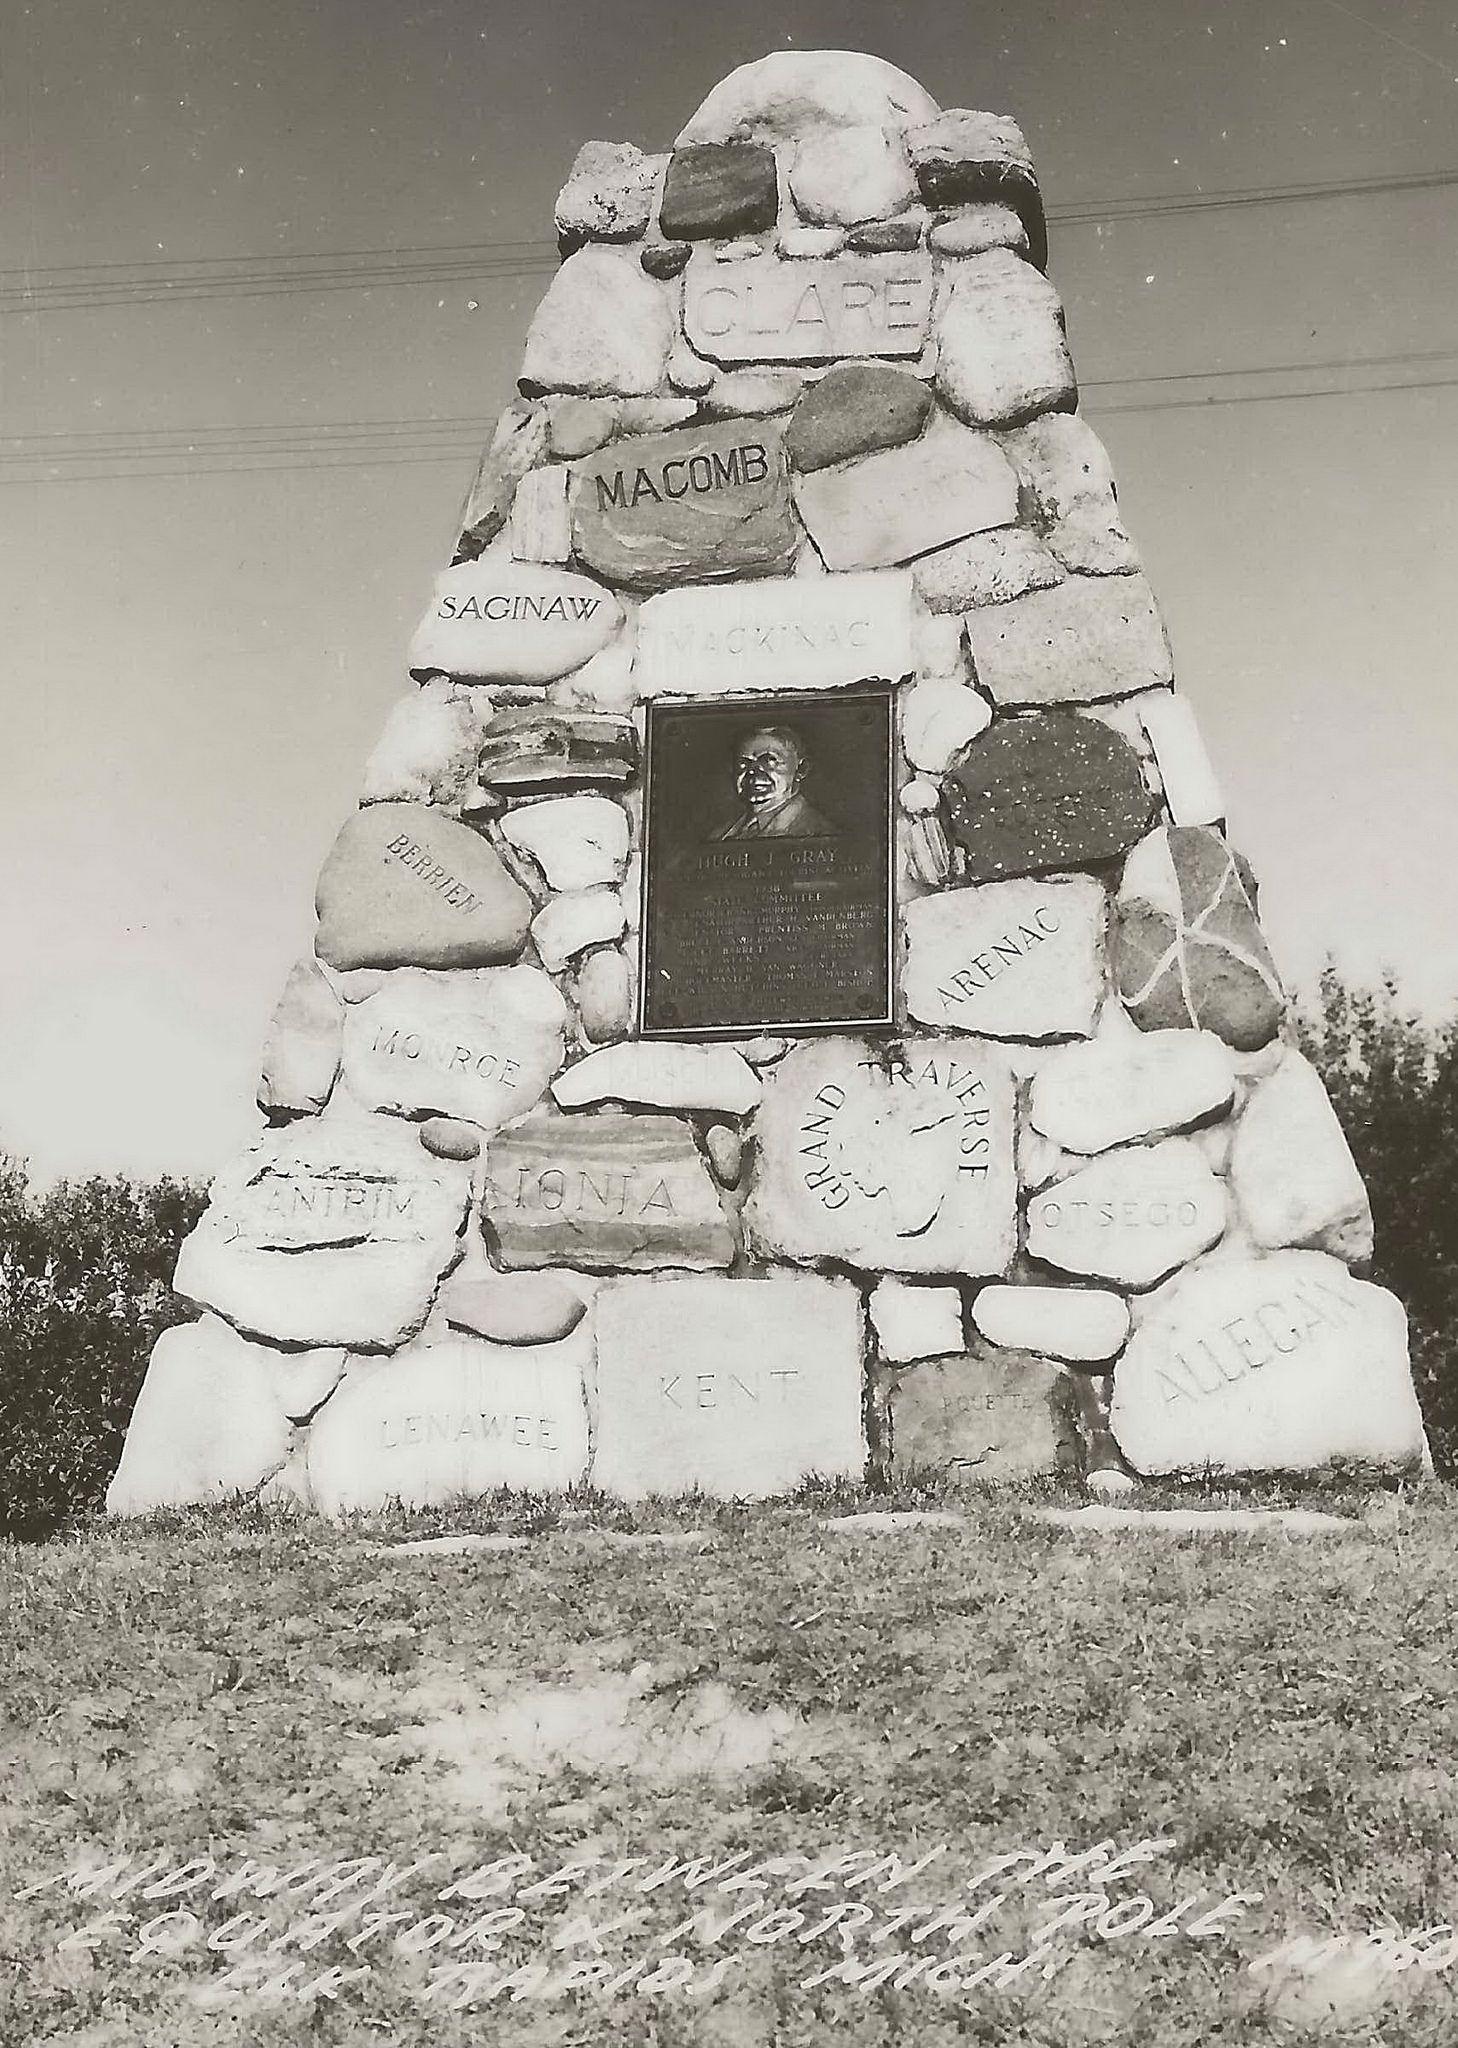 Michigan antrim county kewadin - Nw Elk Rapids Kewadin Mi Rppc Roadside Carin State County Tourism Memorial June 28 1938 Hugh J Gray Cairn Officially Dedicated His Own Memorial Antrim